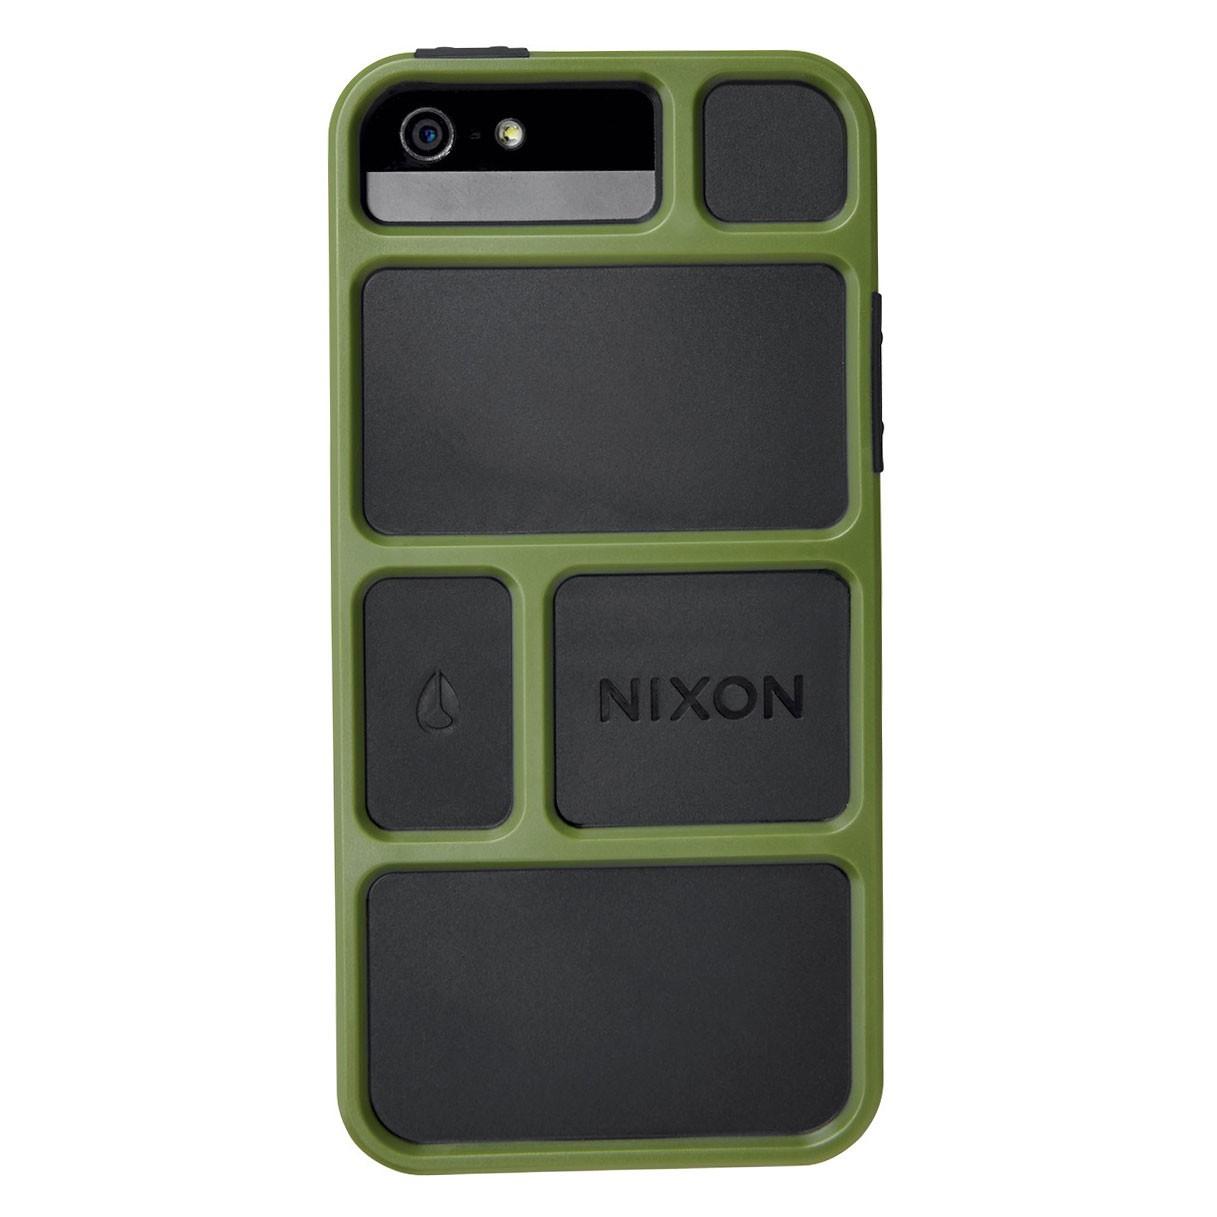 Obal na telefon Nixon Gridlock Iphone 5 surplus/black + doručení do 24 hodin